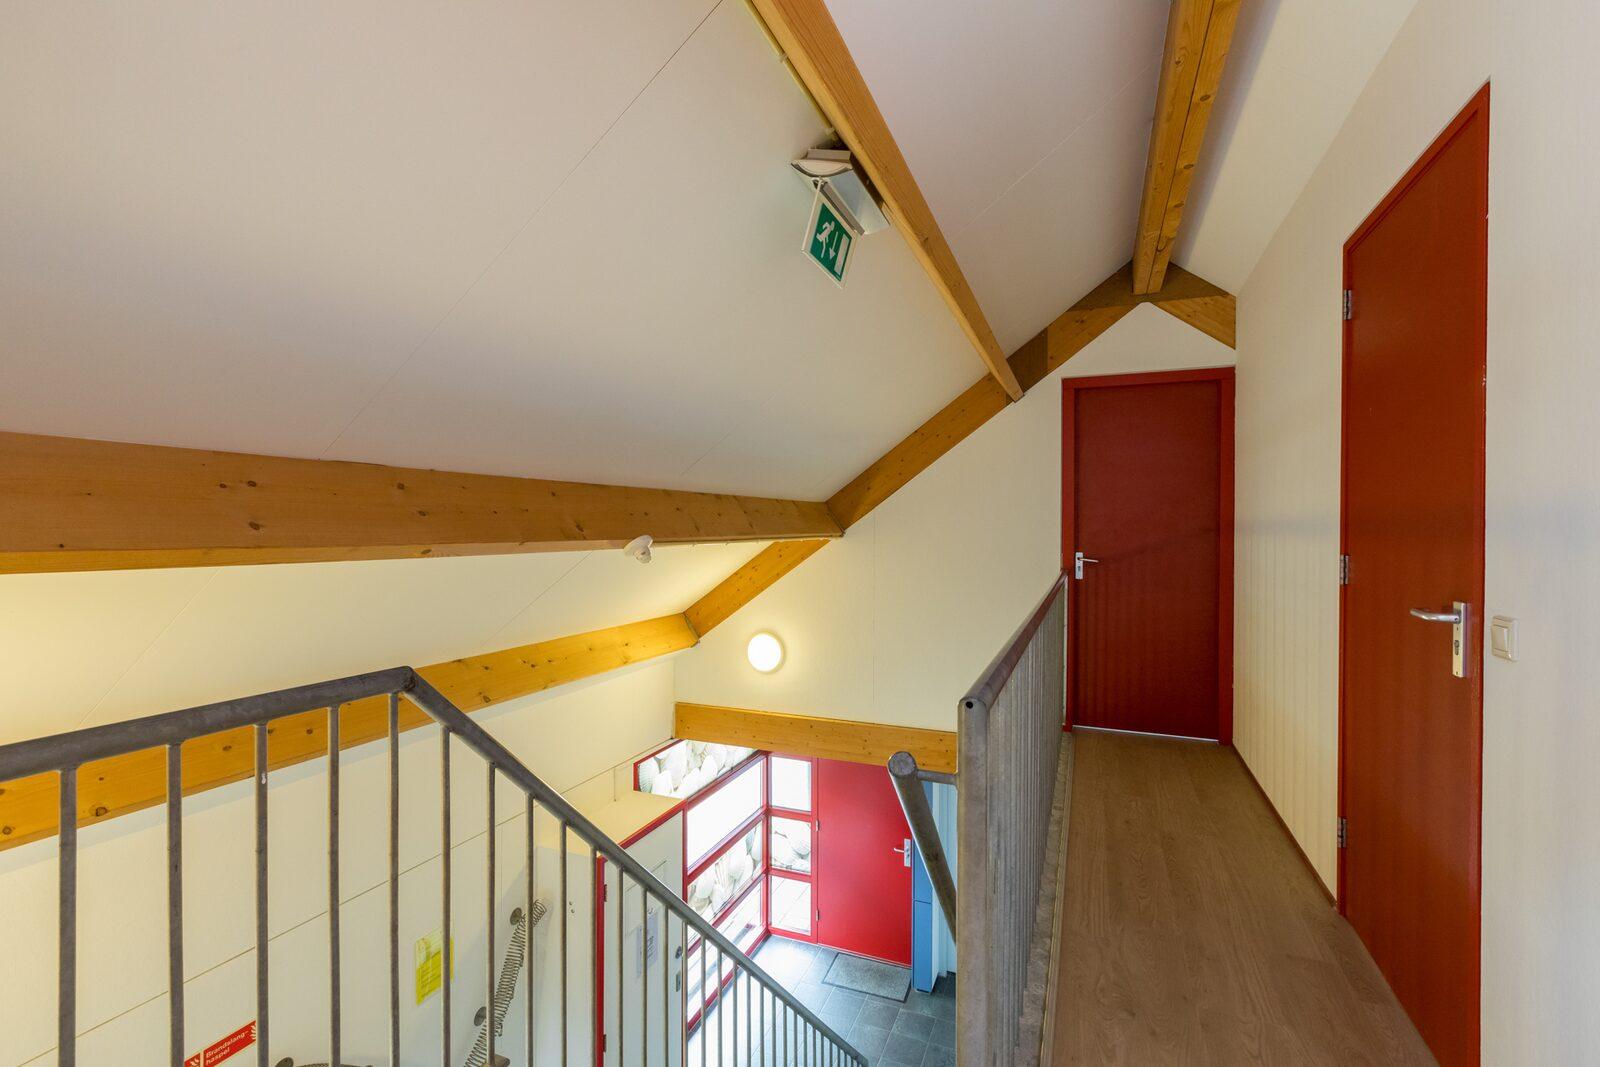 Vakantiehuis - Duinweg 135 | Zoutelande 'Zonnevylle'